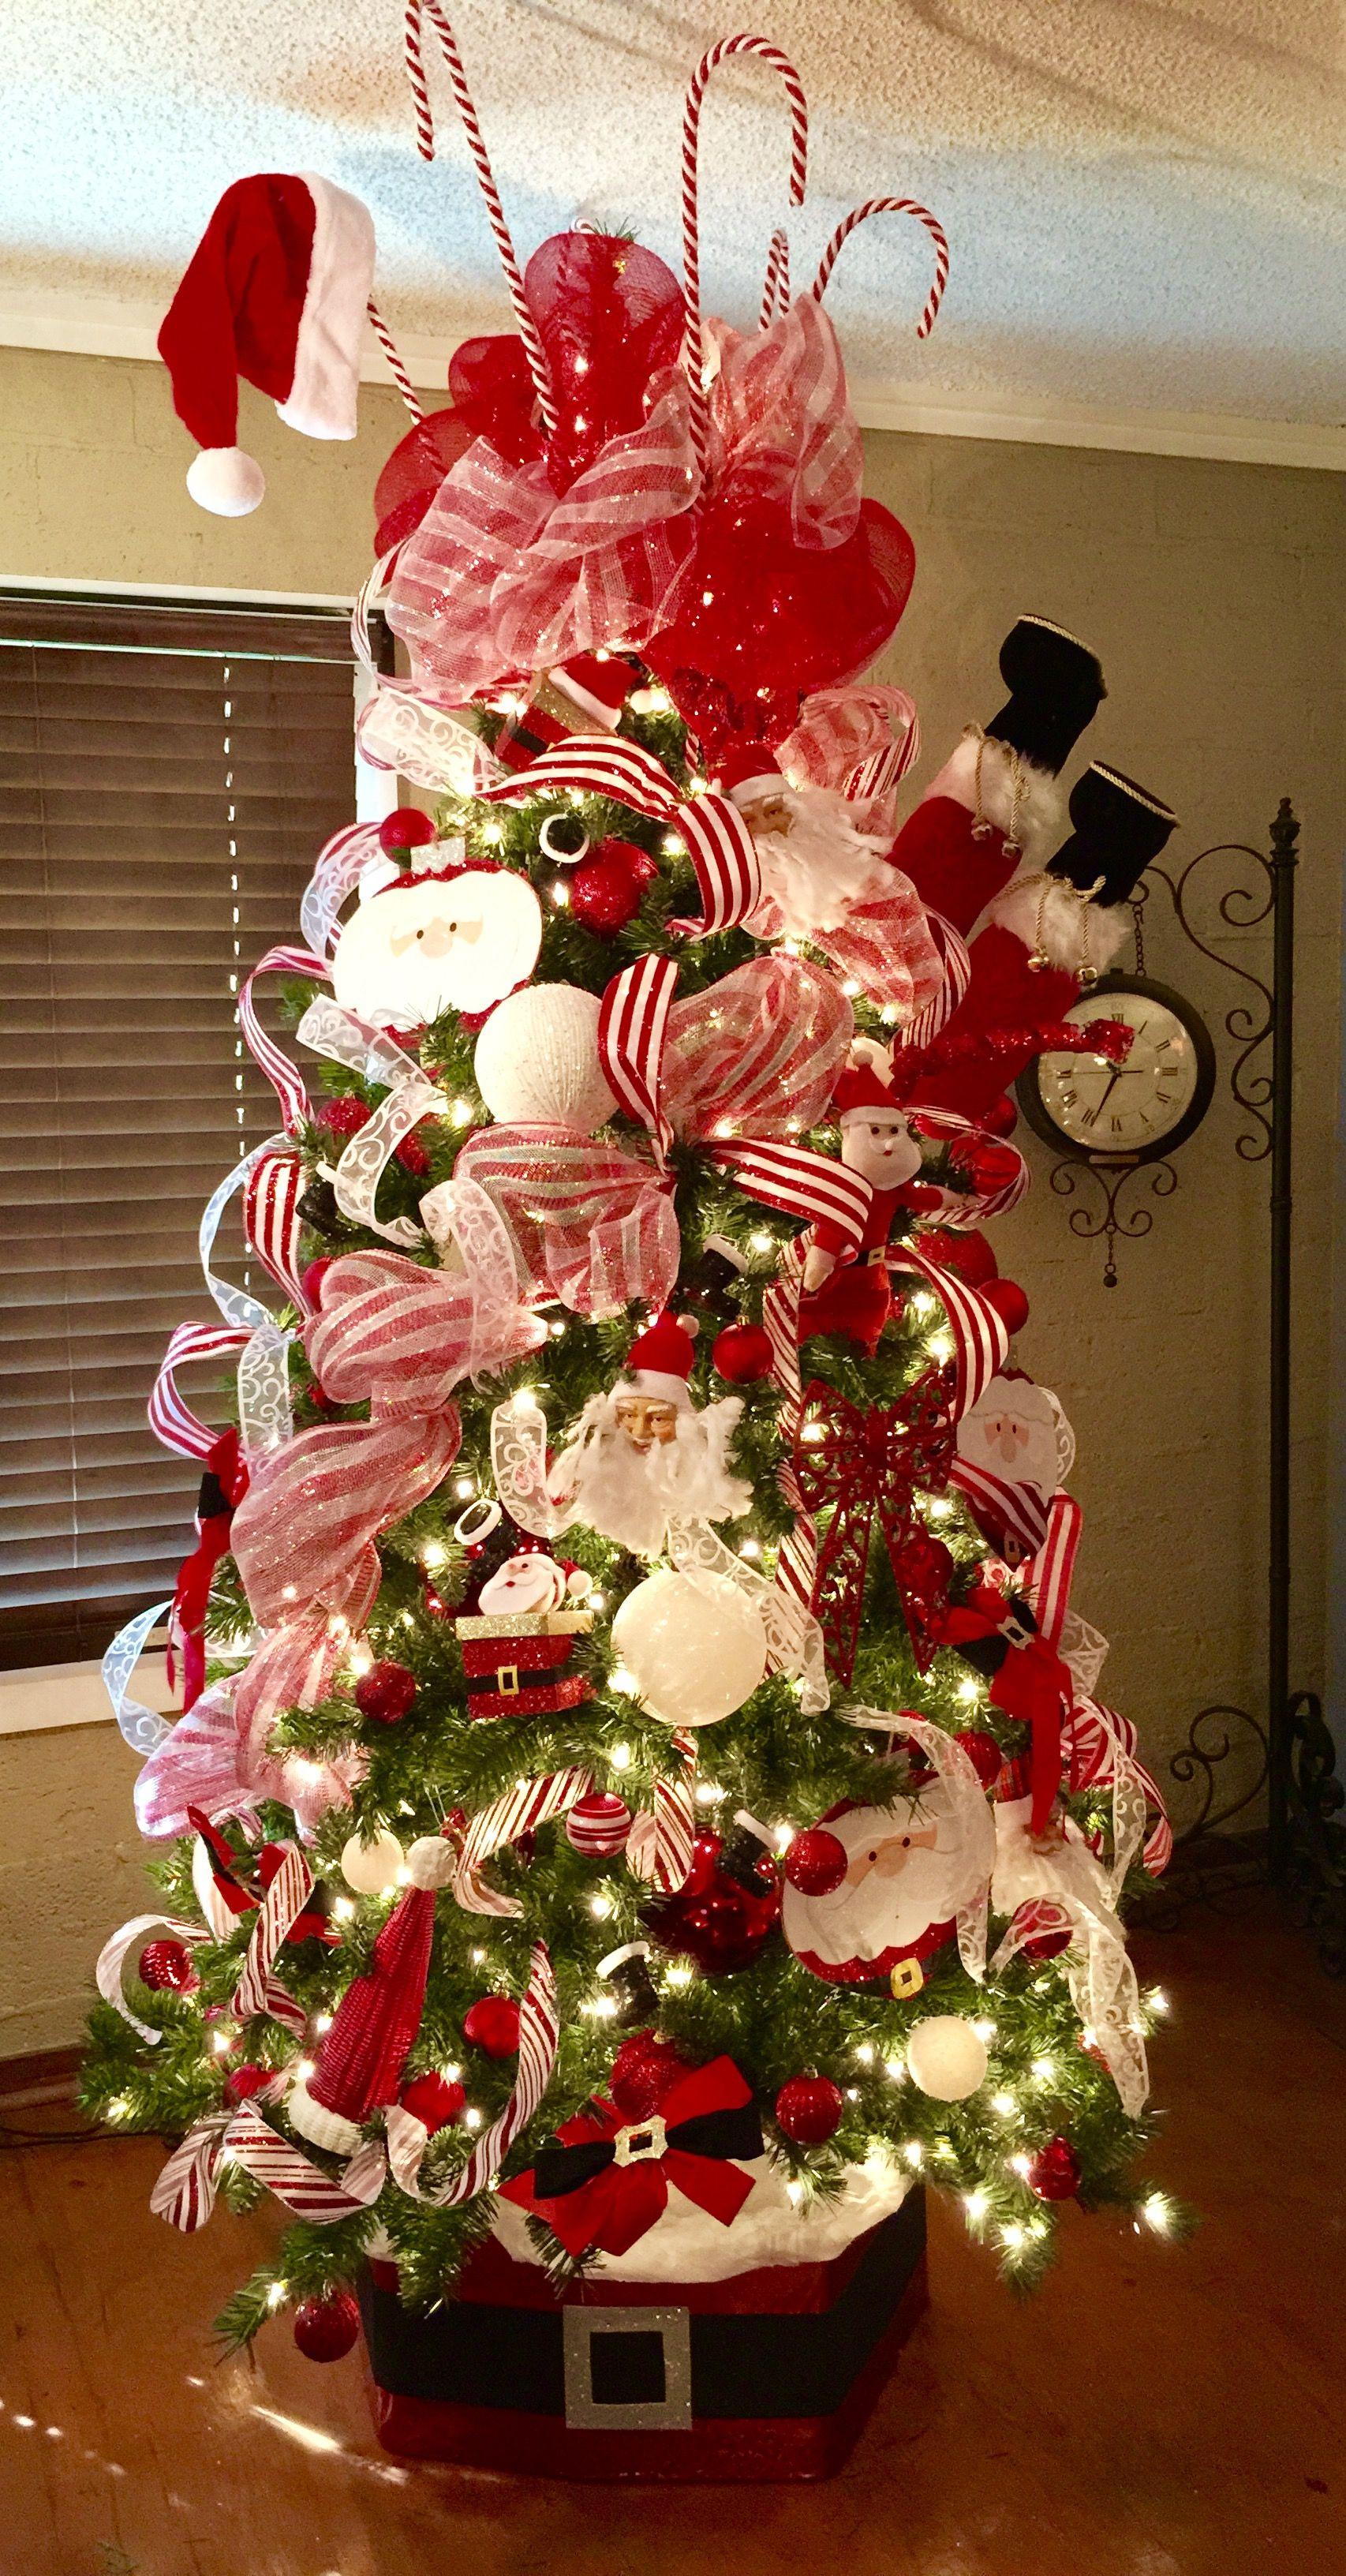 Best Decoration Ideas: 40+ Best Christmas Tree Decor Ideas & Inspirations For